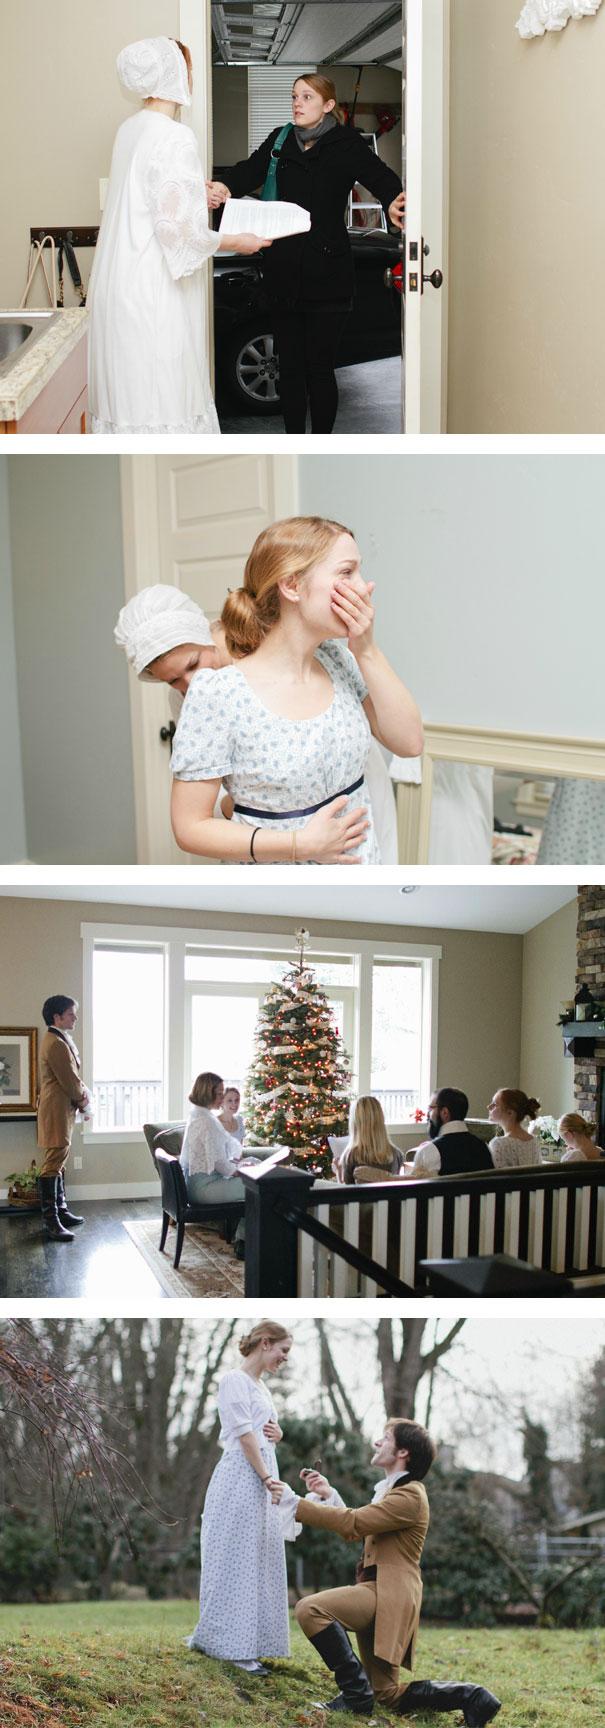 creative-marriage-proposals-engagement-ideas-5-575e999167447__605